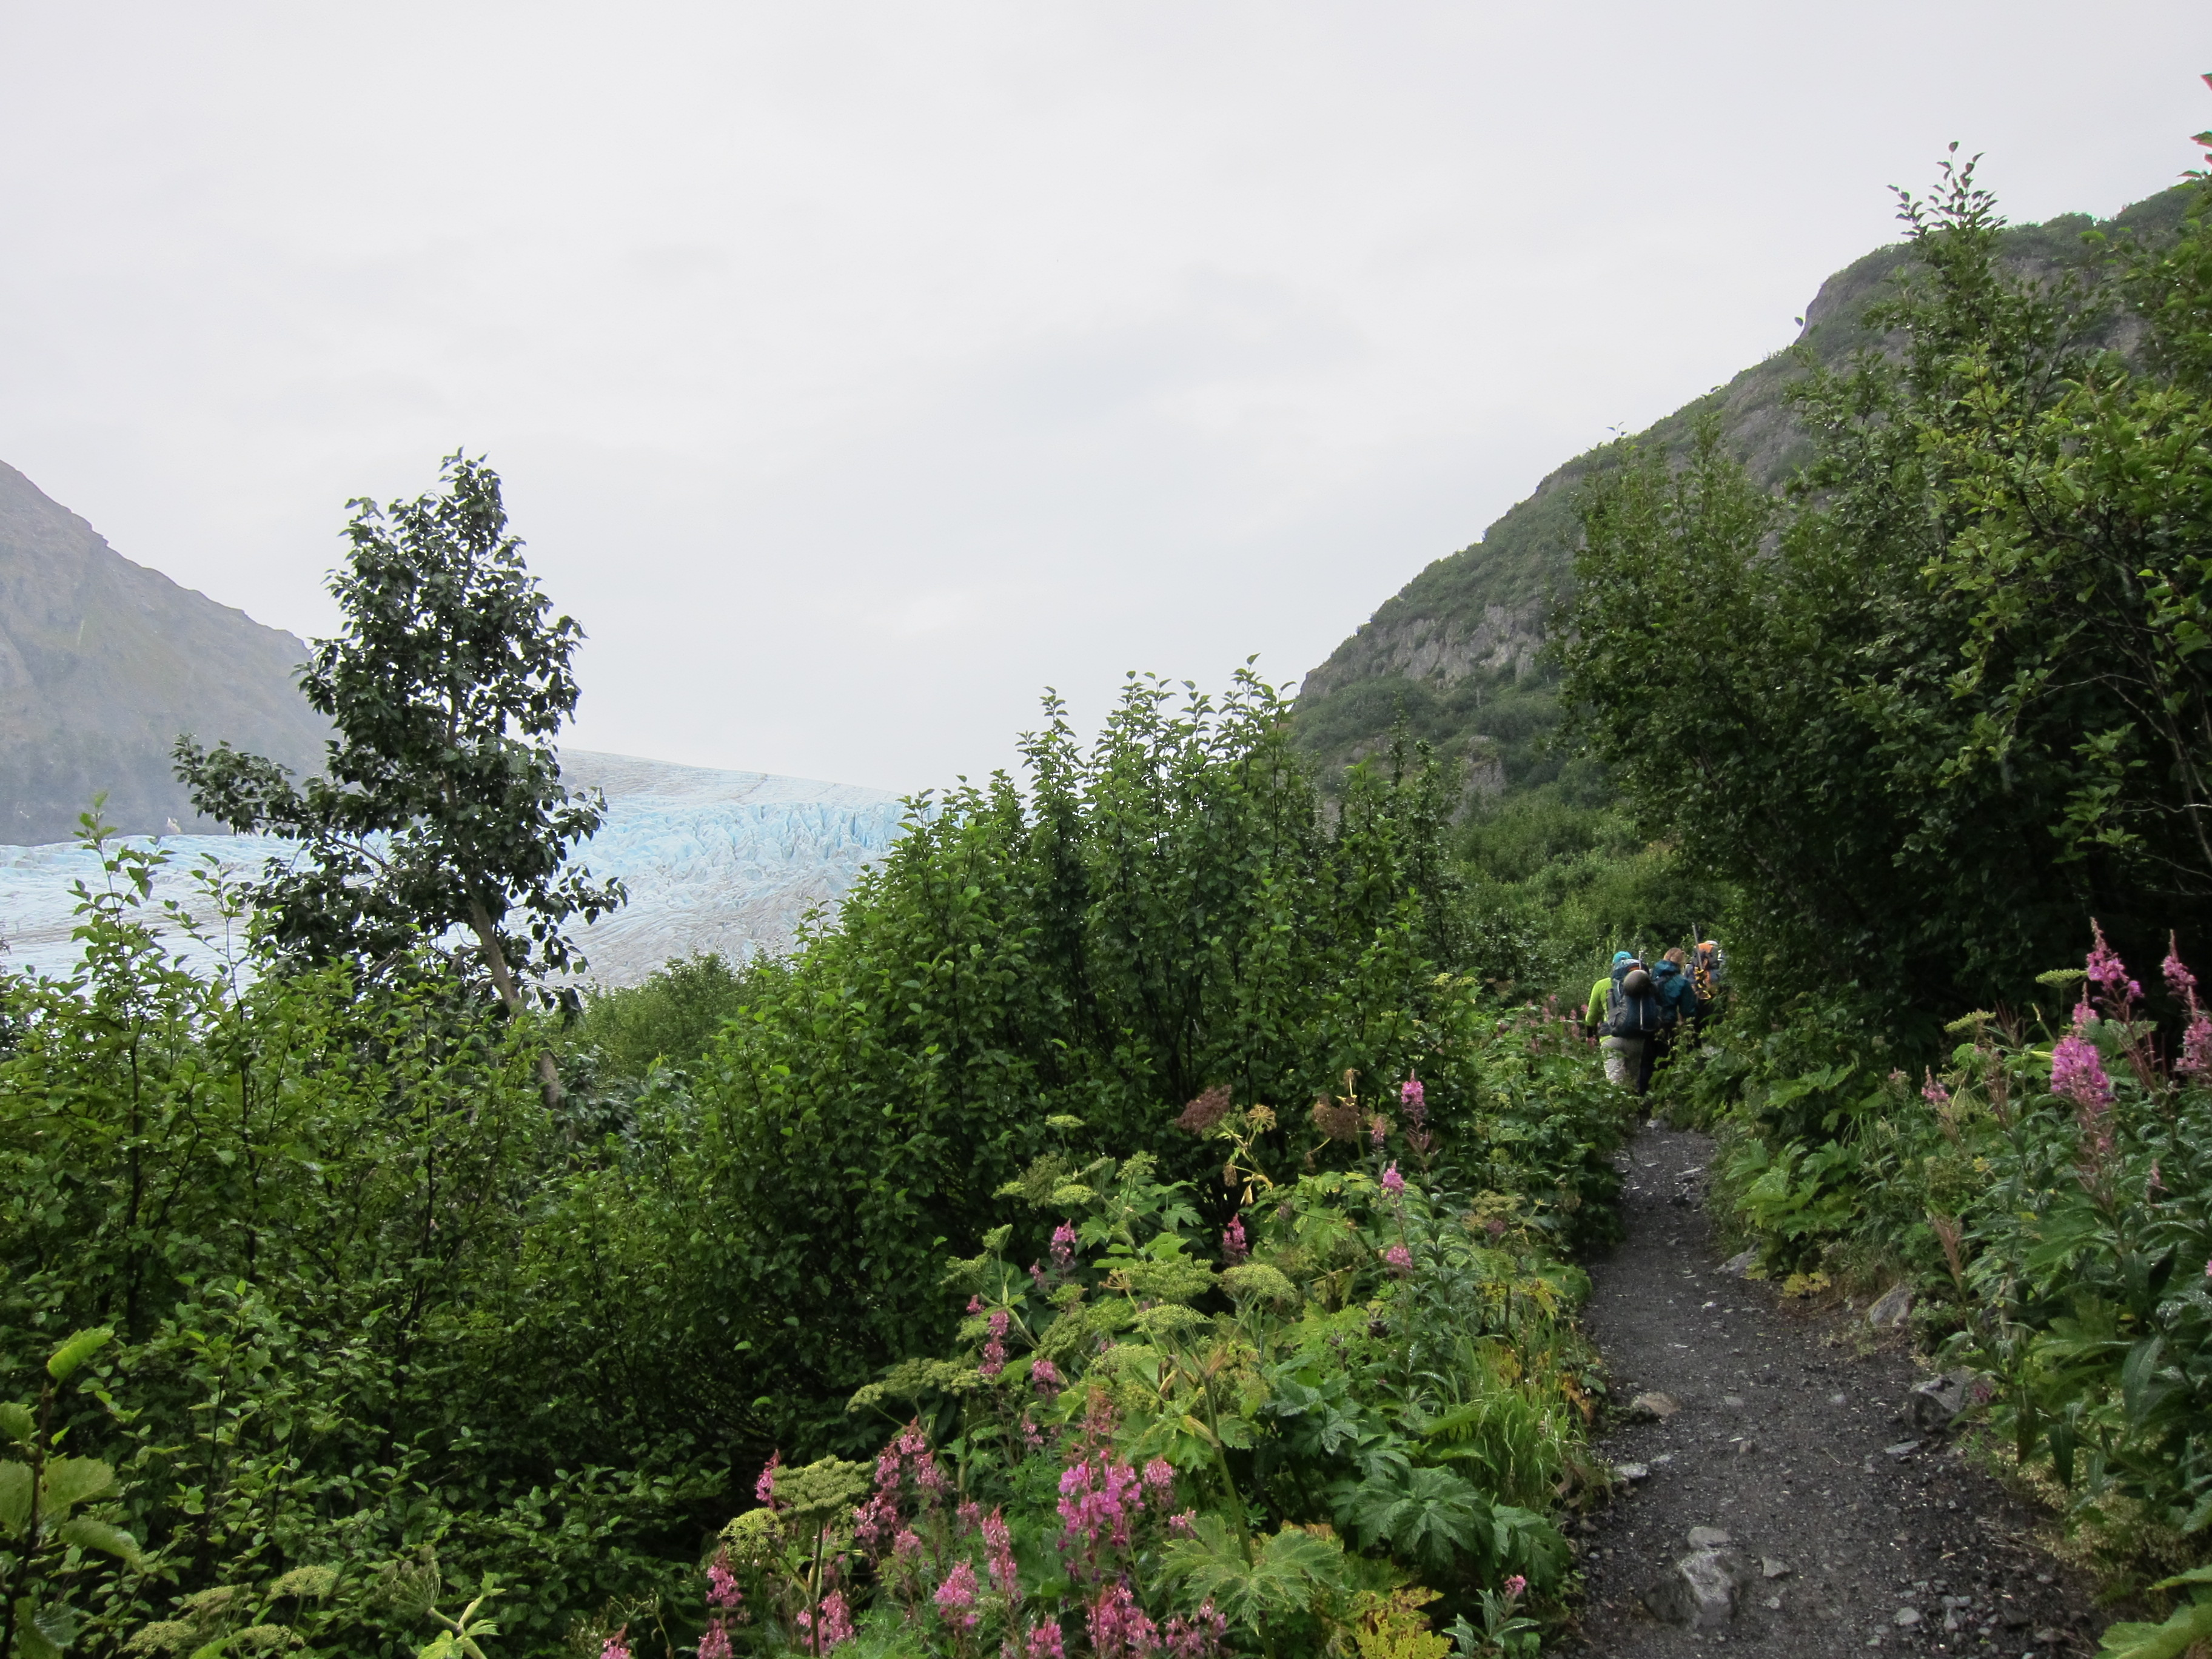 Hiking Trail Kenai Fjords National Park at Exit Glacier